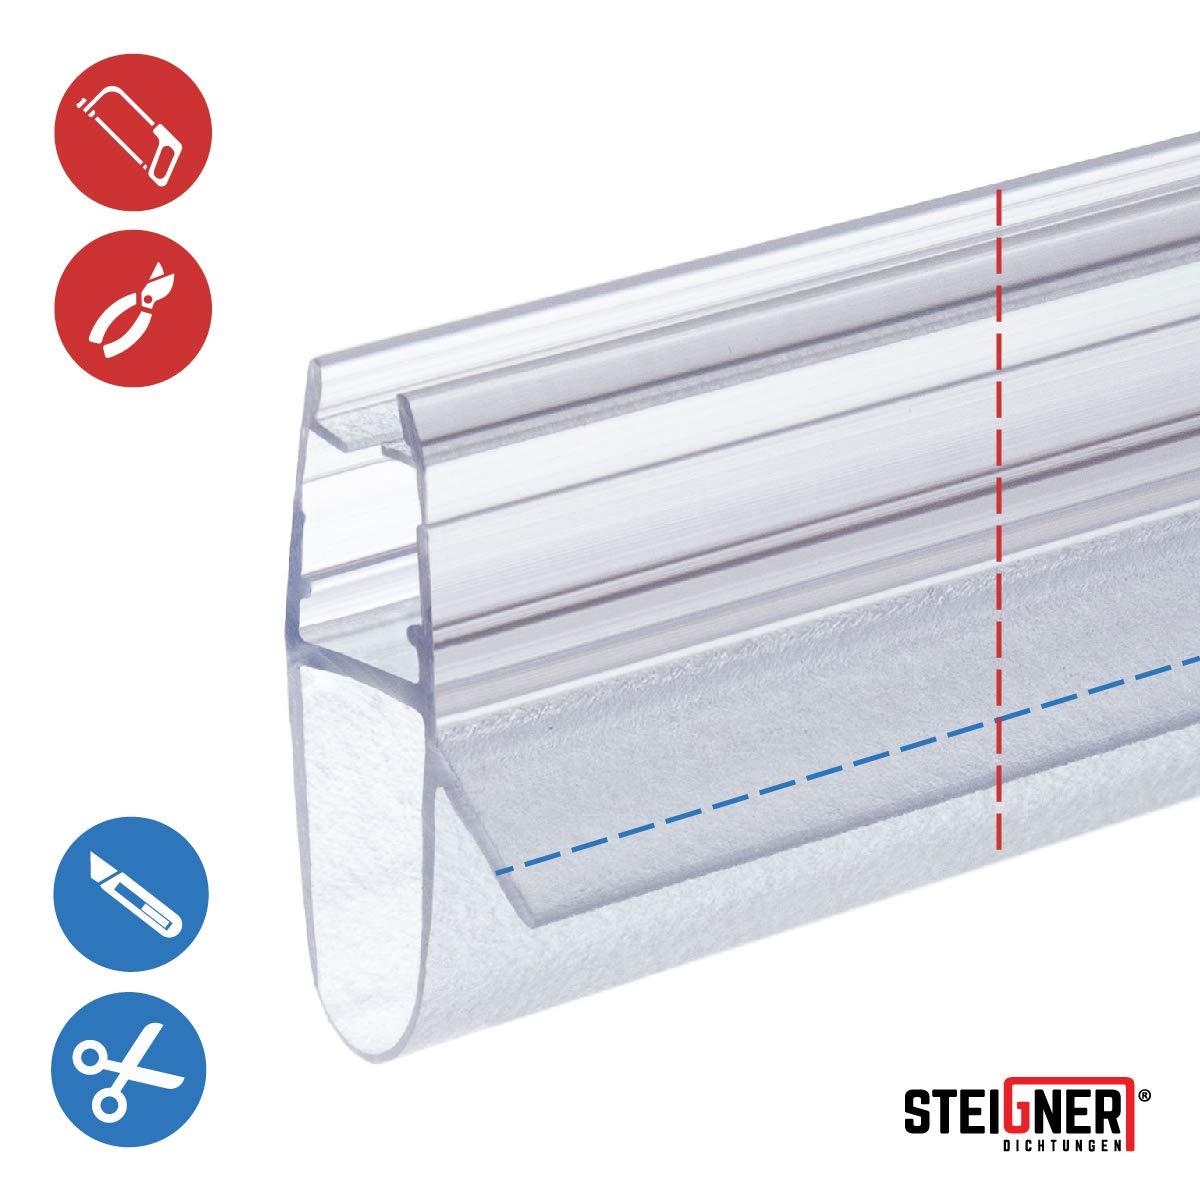 170cm Glasst/ärke 5// 6// 7// 8 mm STEIGNER Duschdichtung Gerade PVC Ersatzdichtung f/ür Dusche UK17